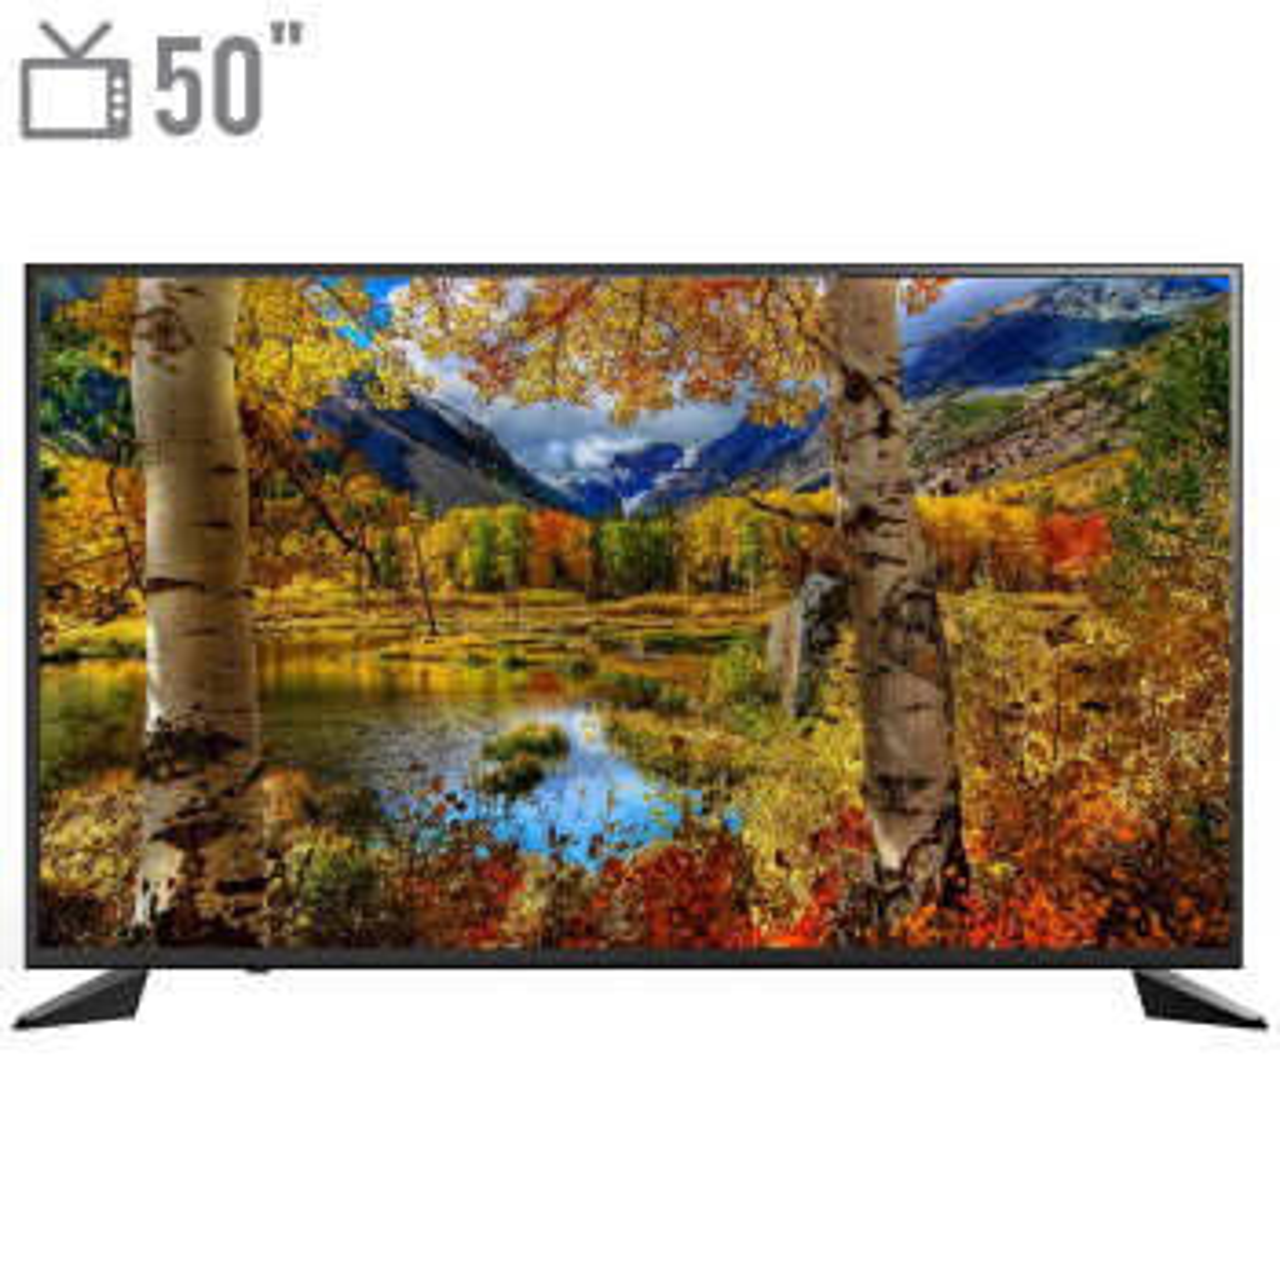 تلویزیون ال ای دی اسنوا مدل SLD-50SA120 سایز 50 اینچ